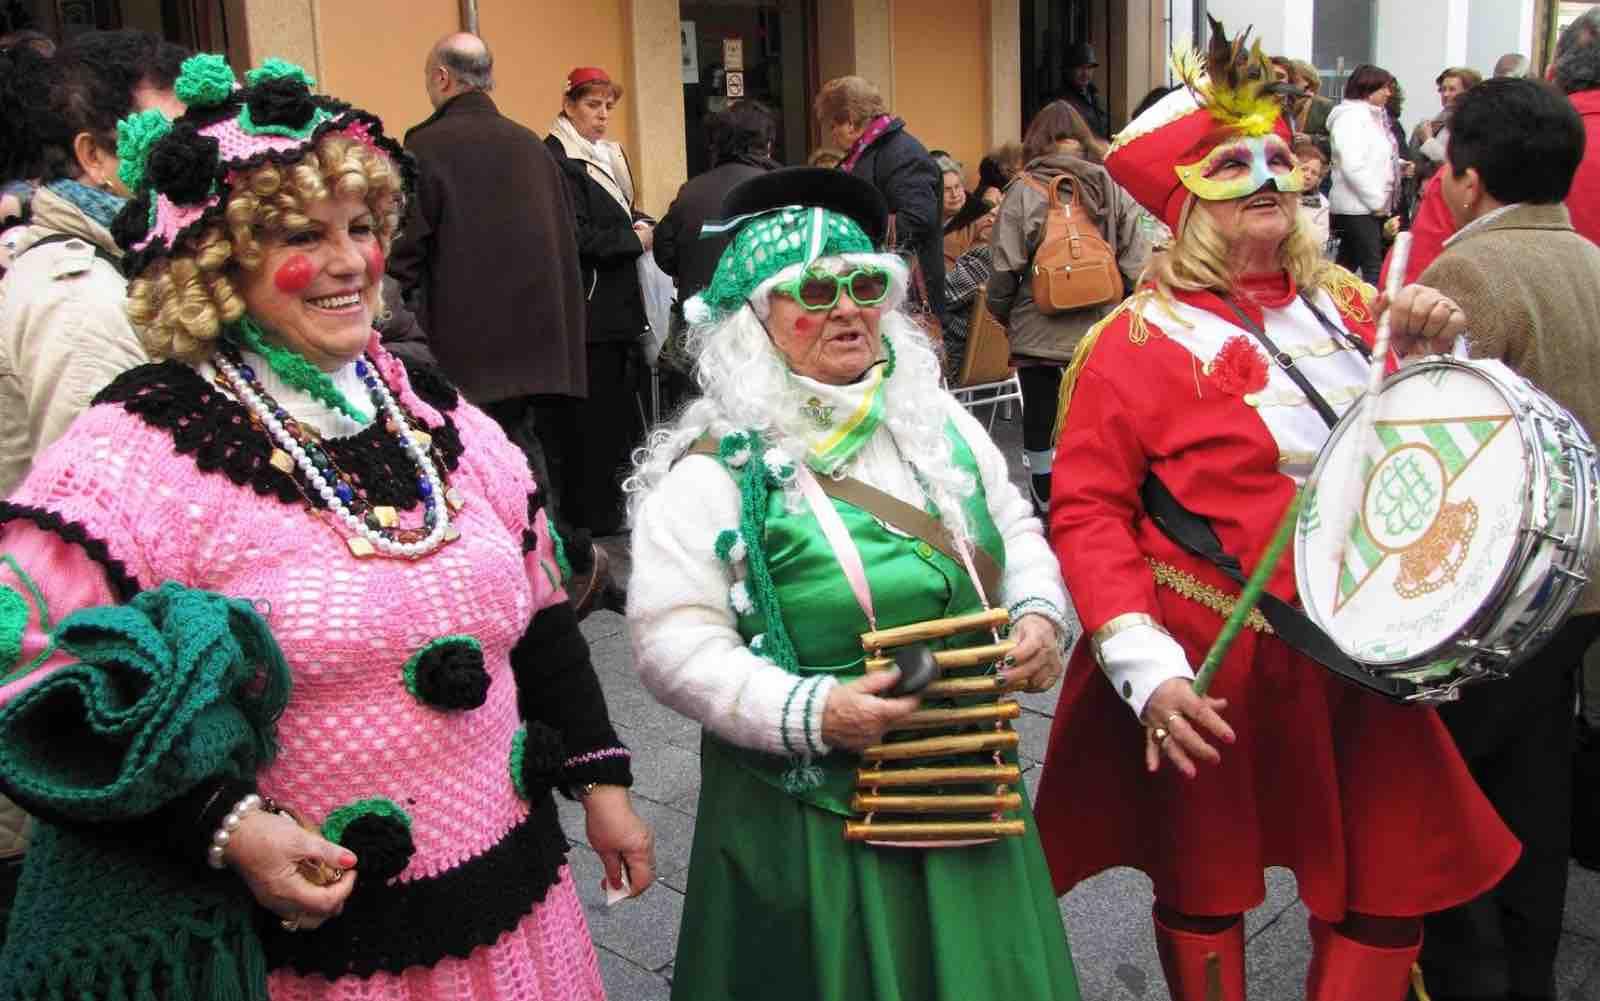 Karneval i Cádiz er humor på kunstnerisk nivå